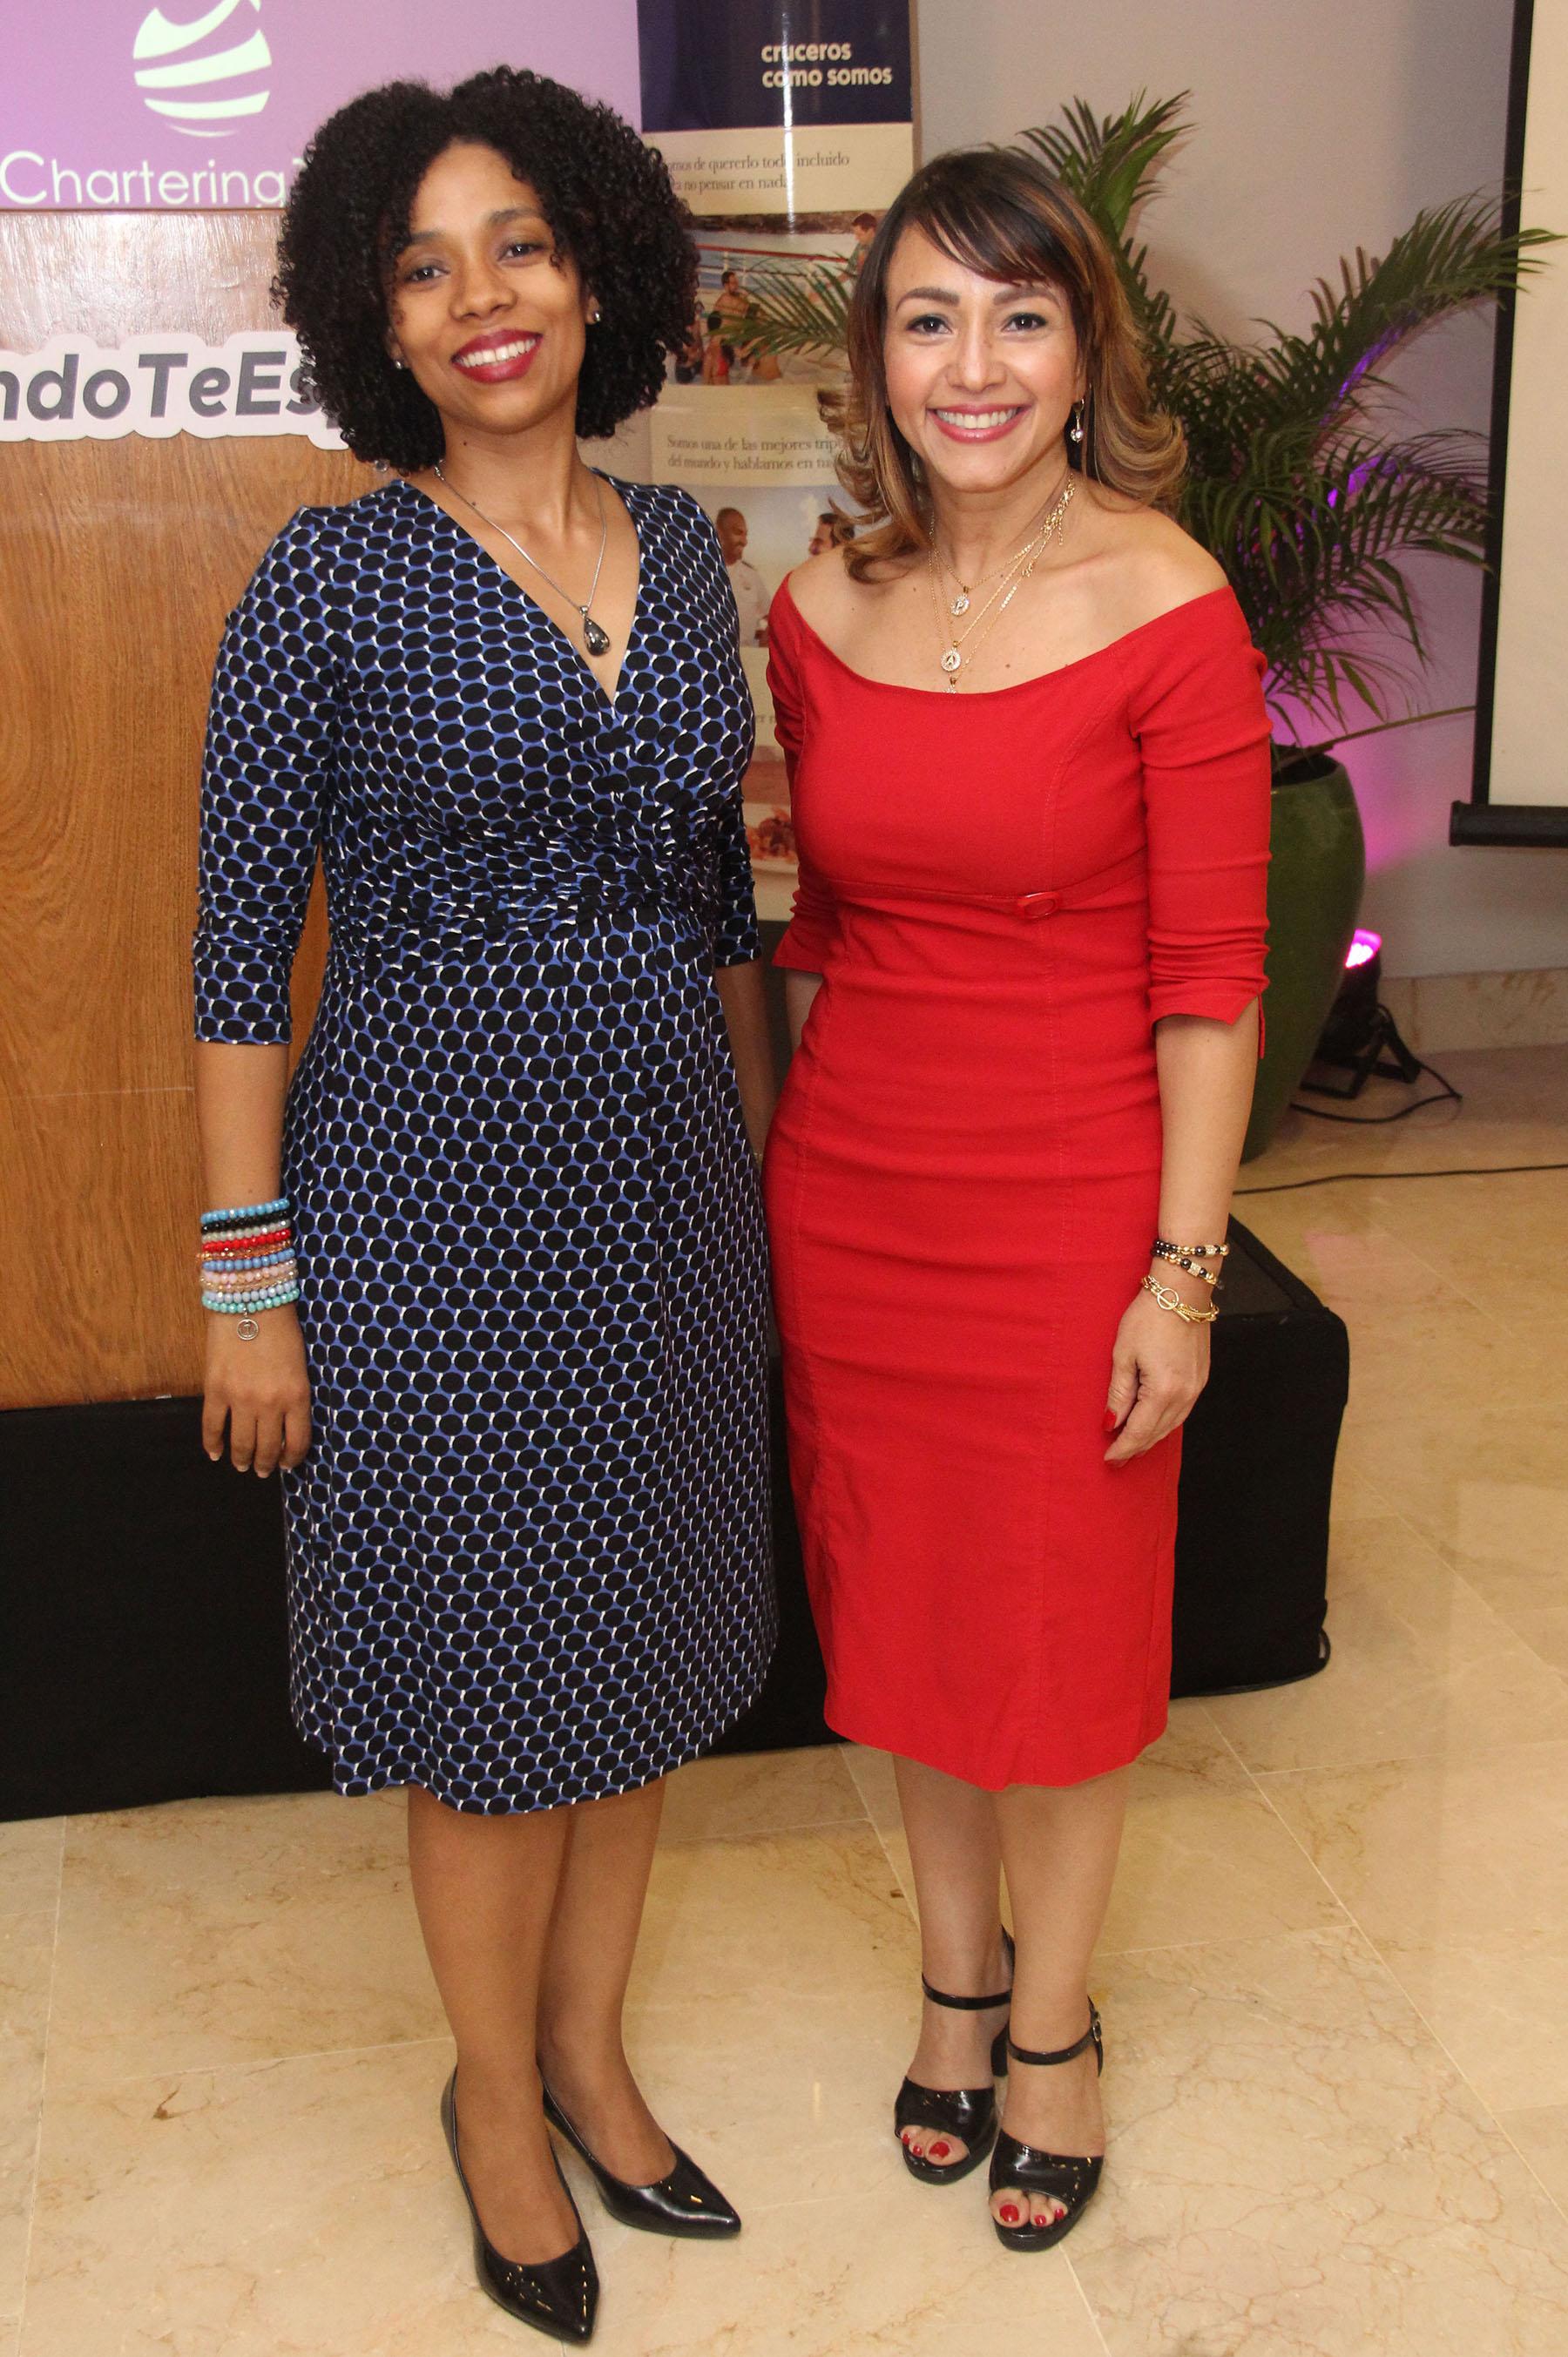 Celeste Olaverria y Maria Polanco